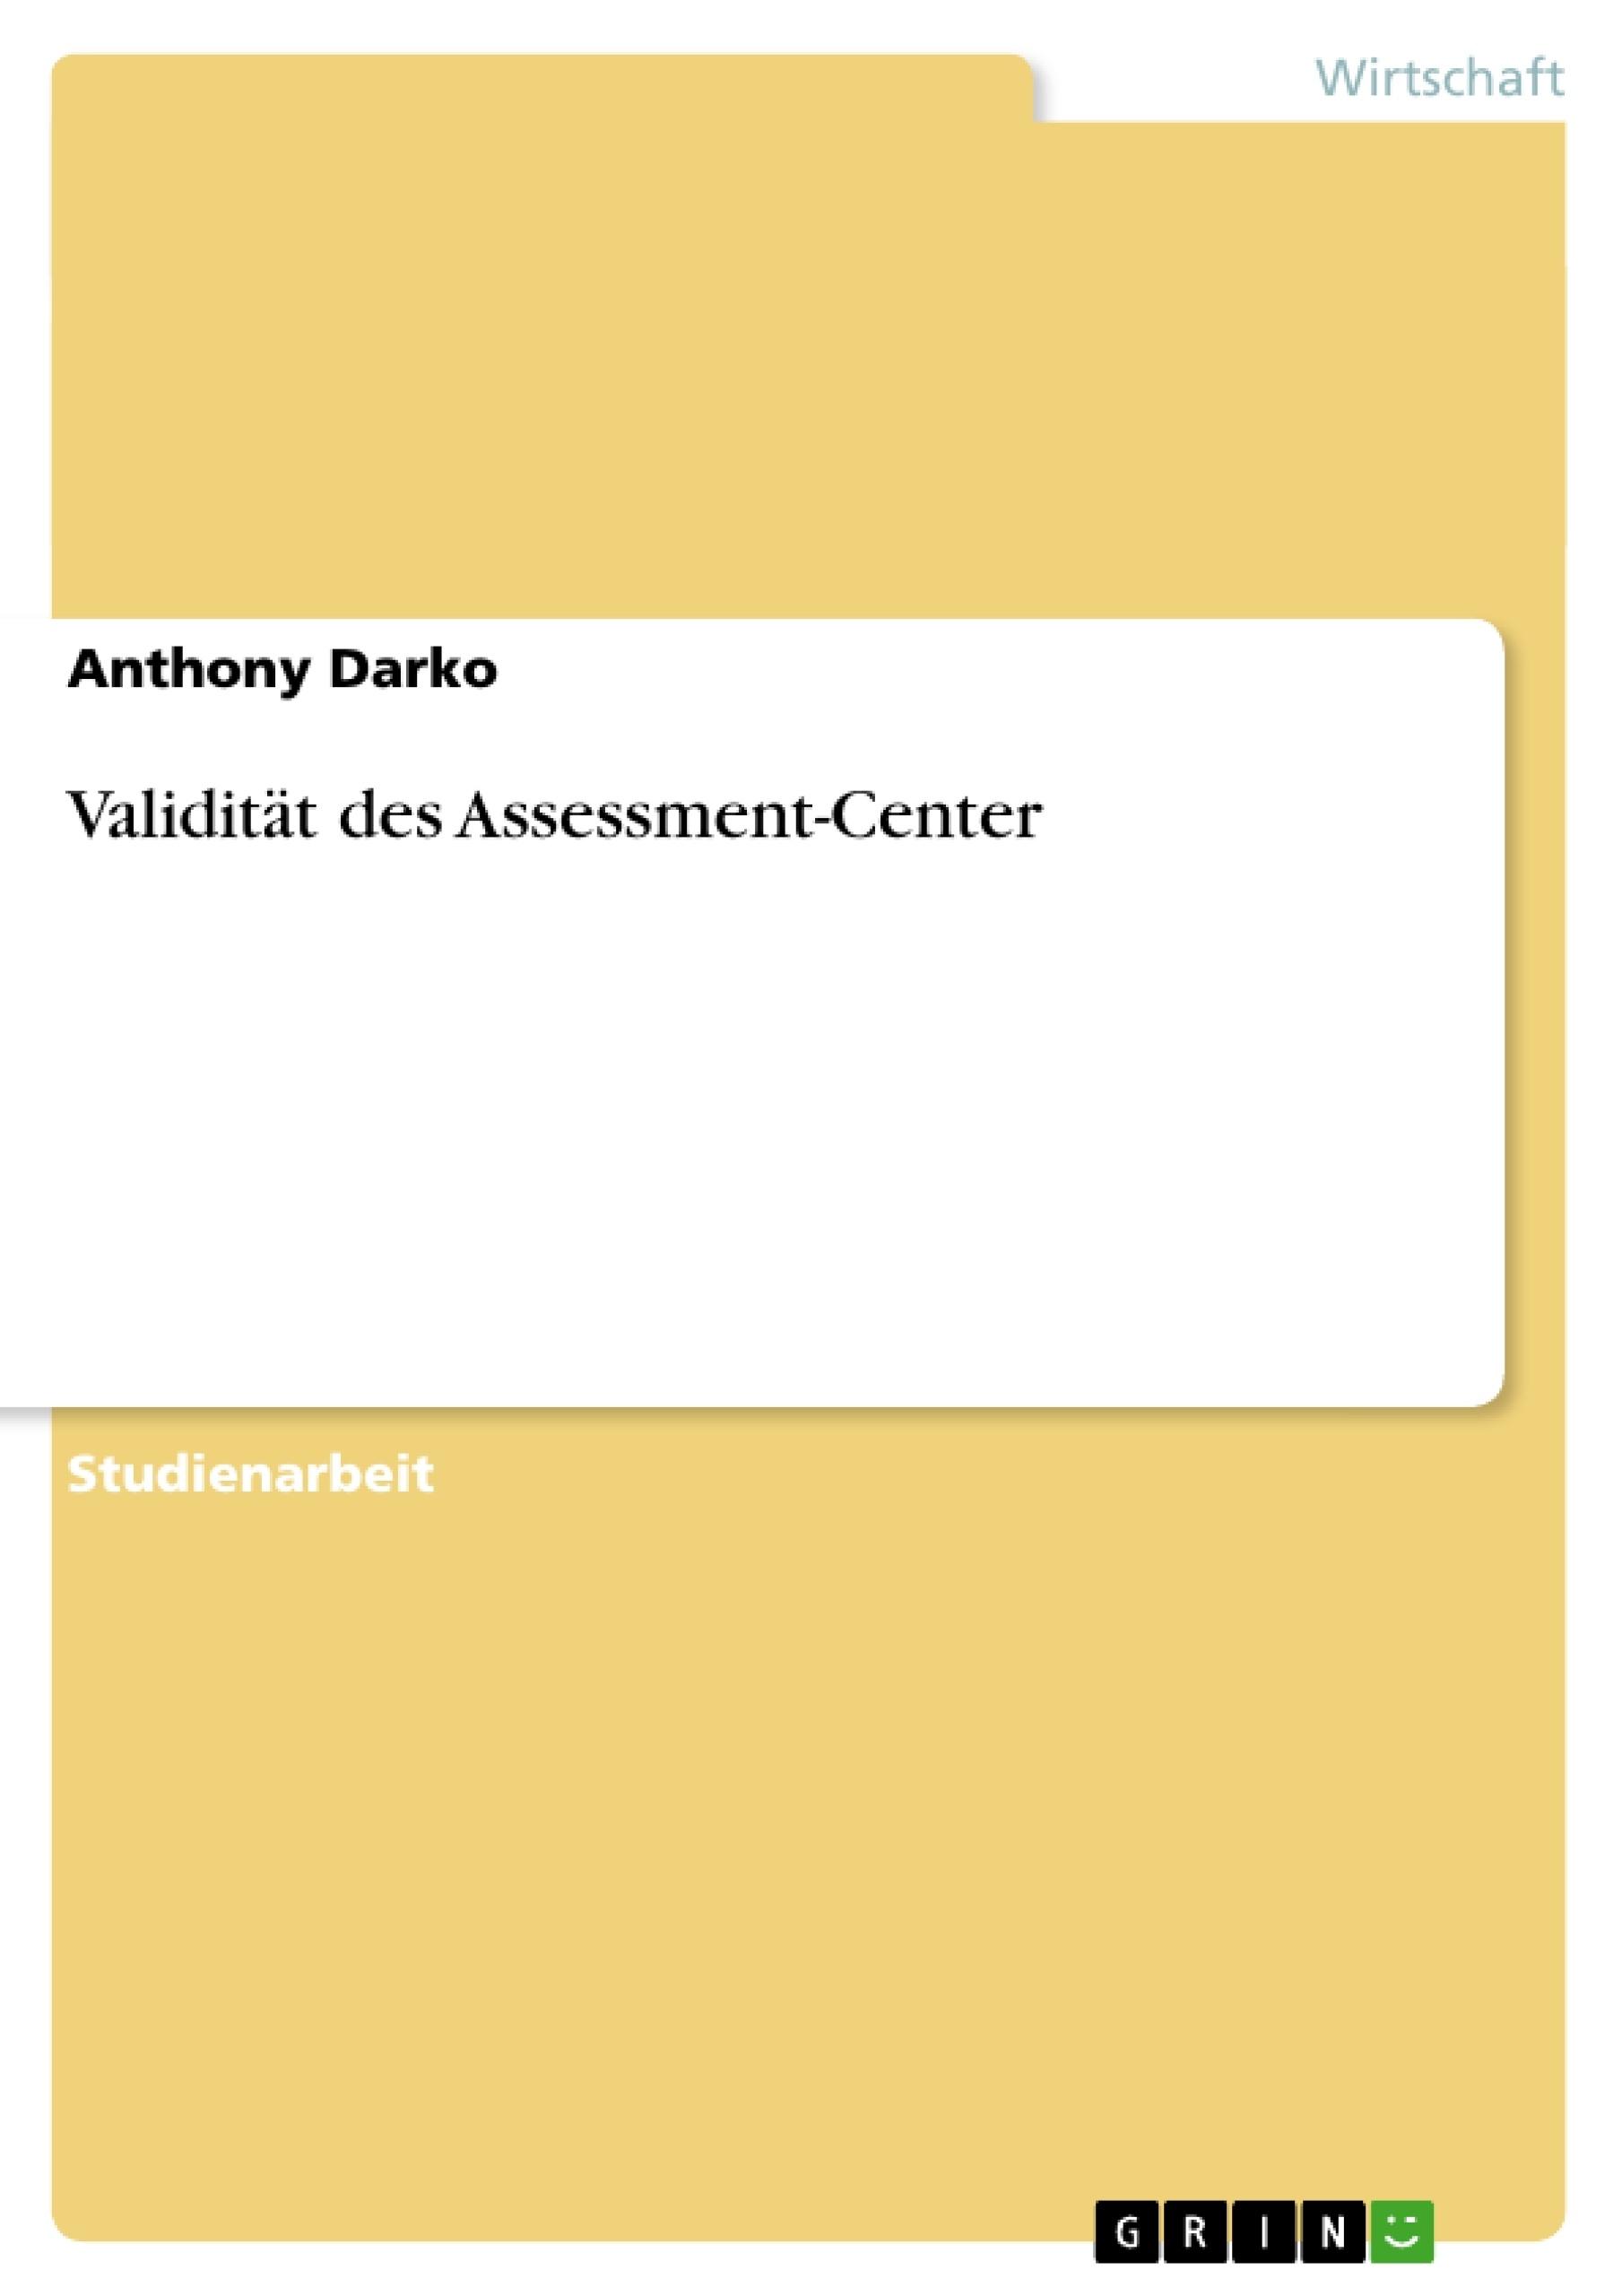 Titel: Validität des Assessment-Center